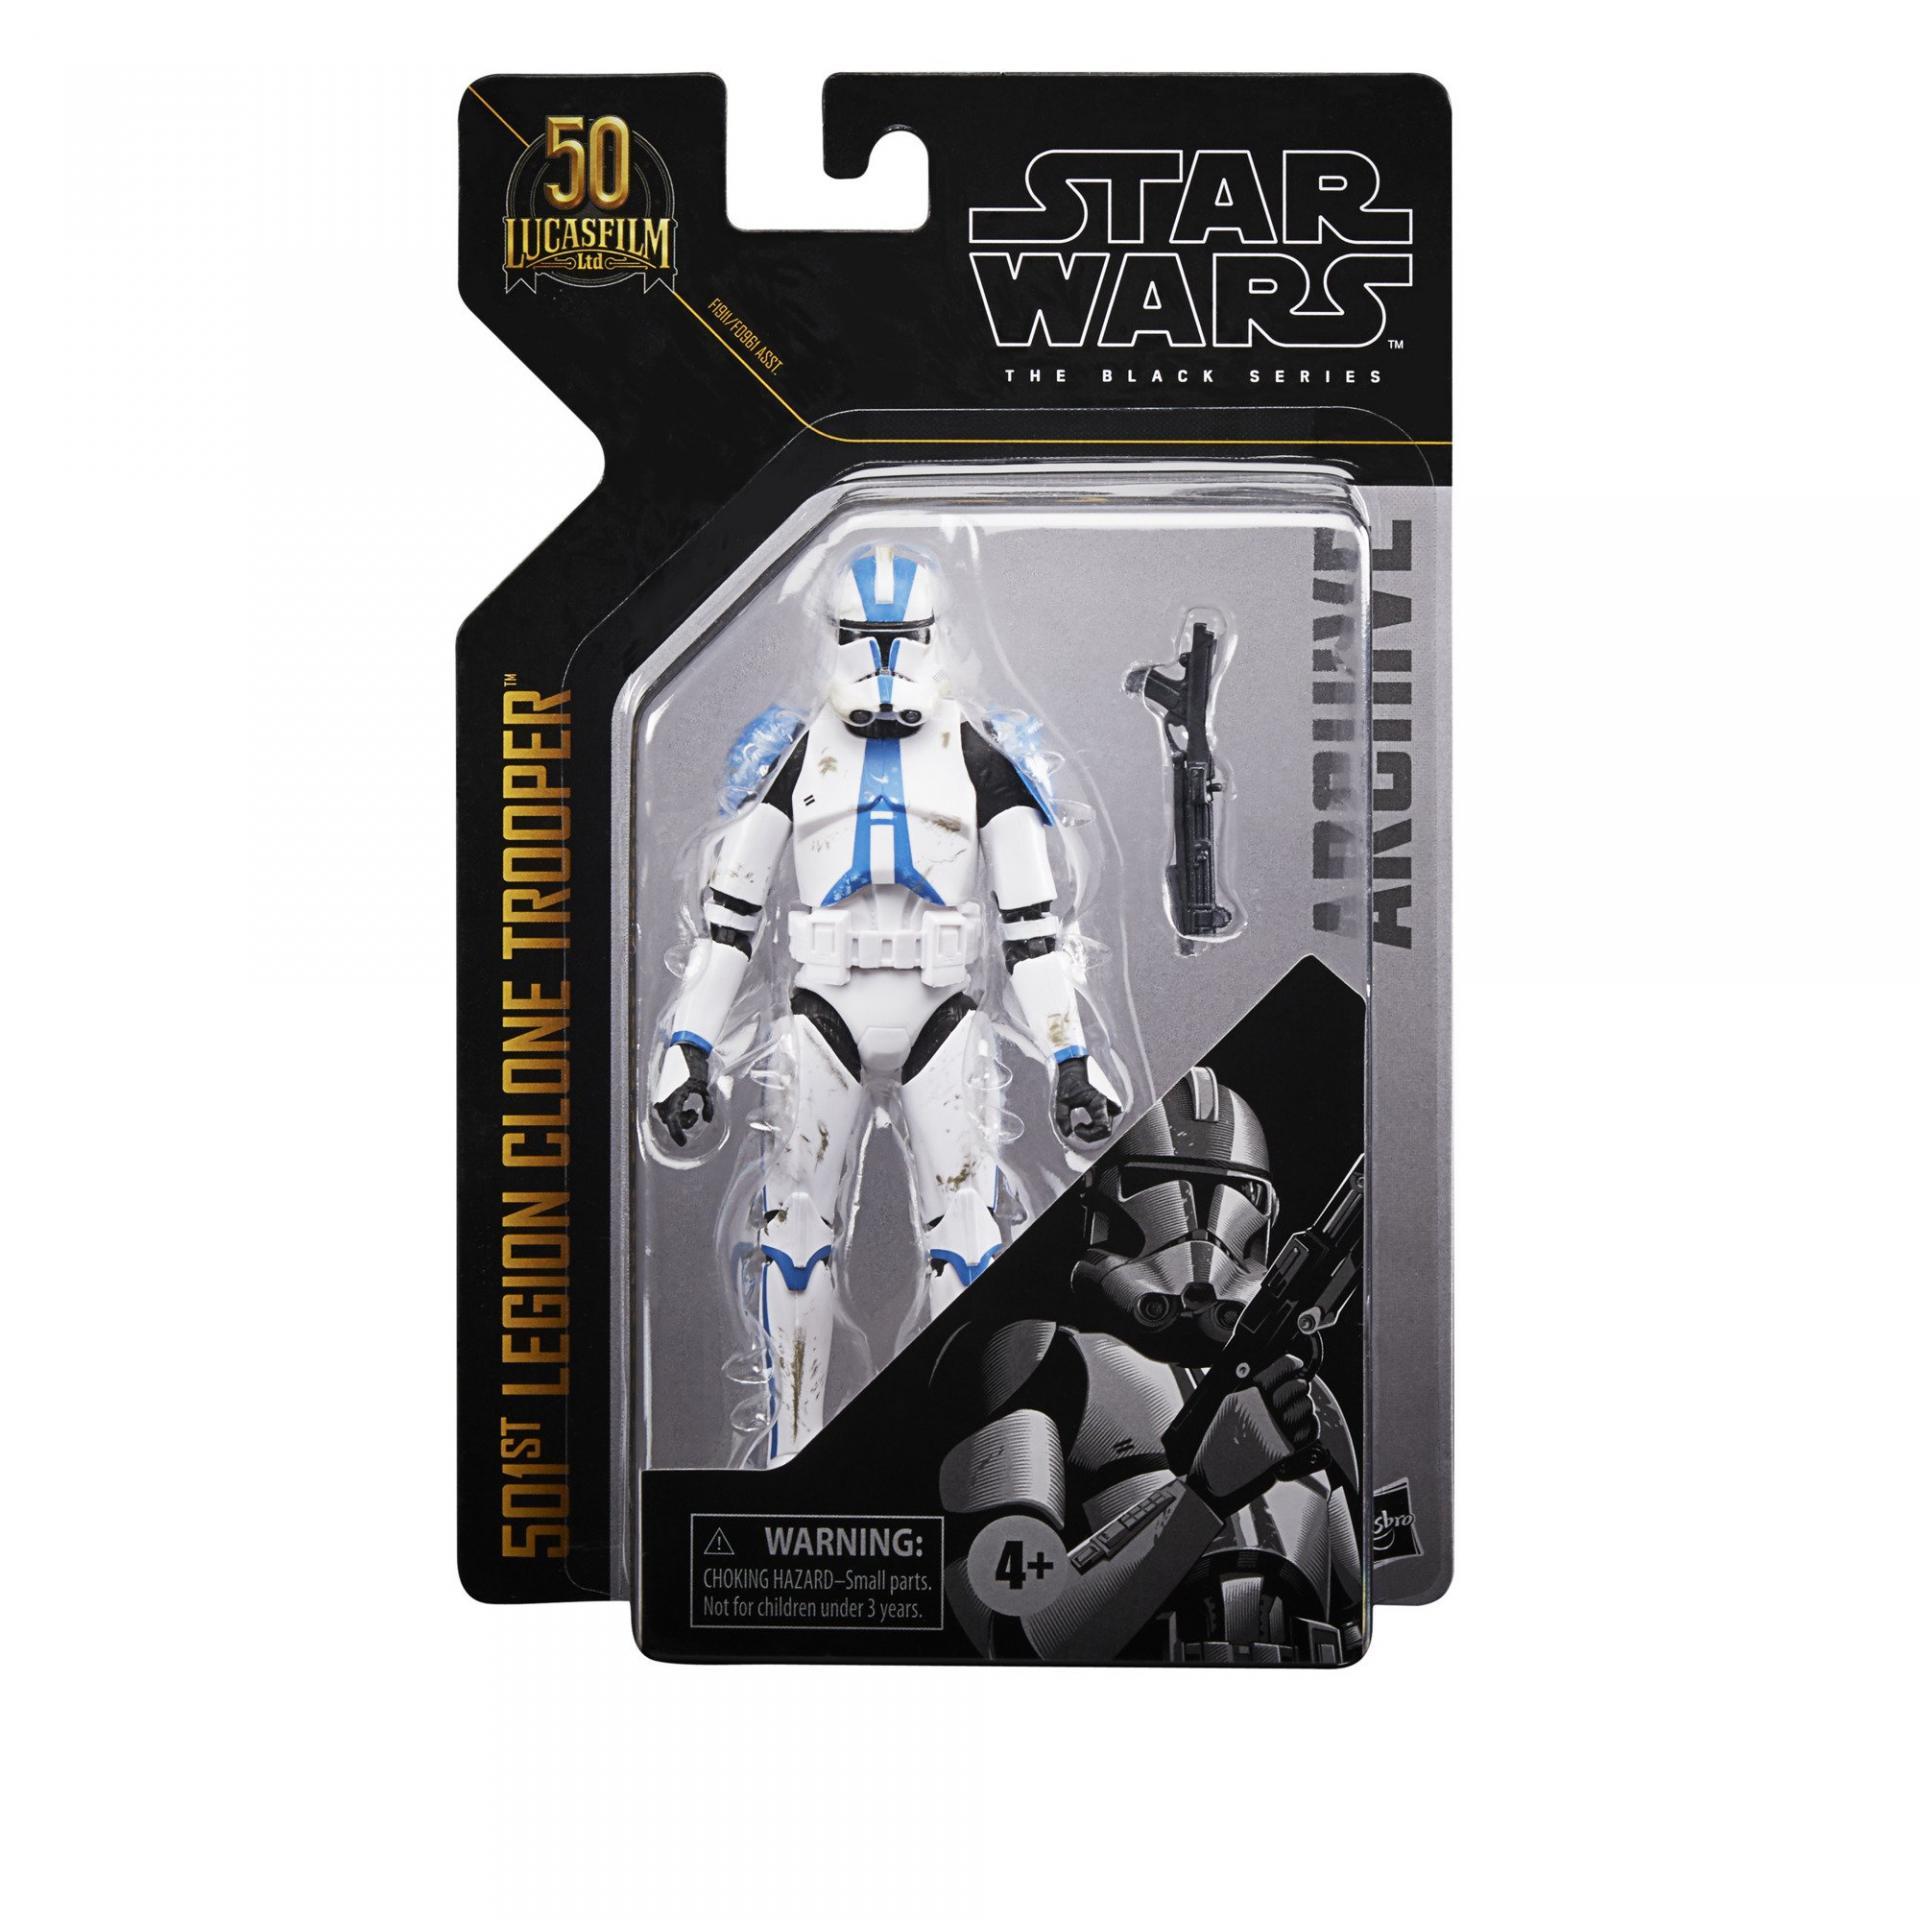 Star wars the black series archive 501st legion clone trooper 15cm6